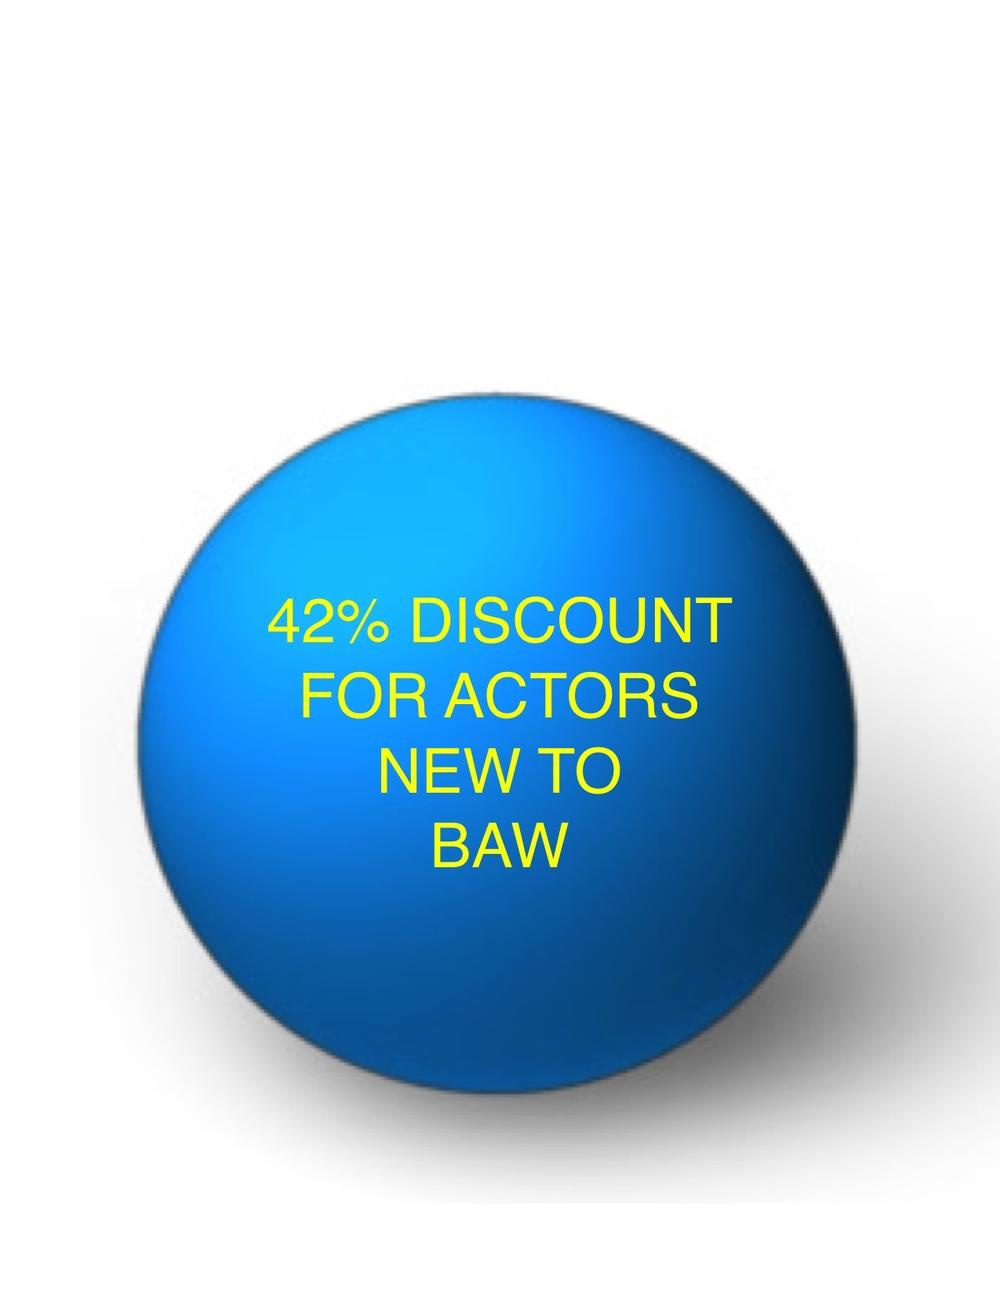 42% discount 2.jpeg